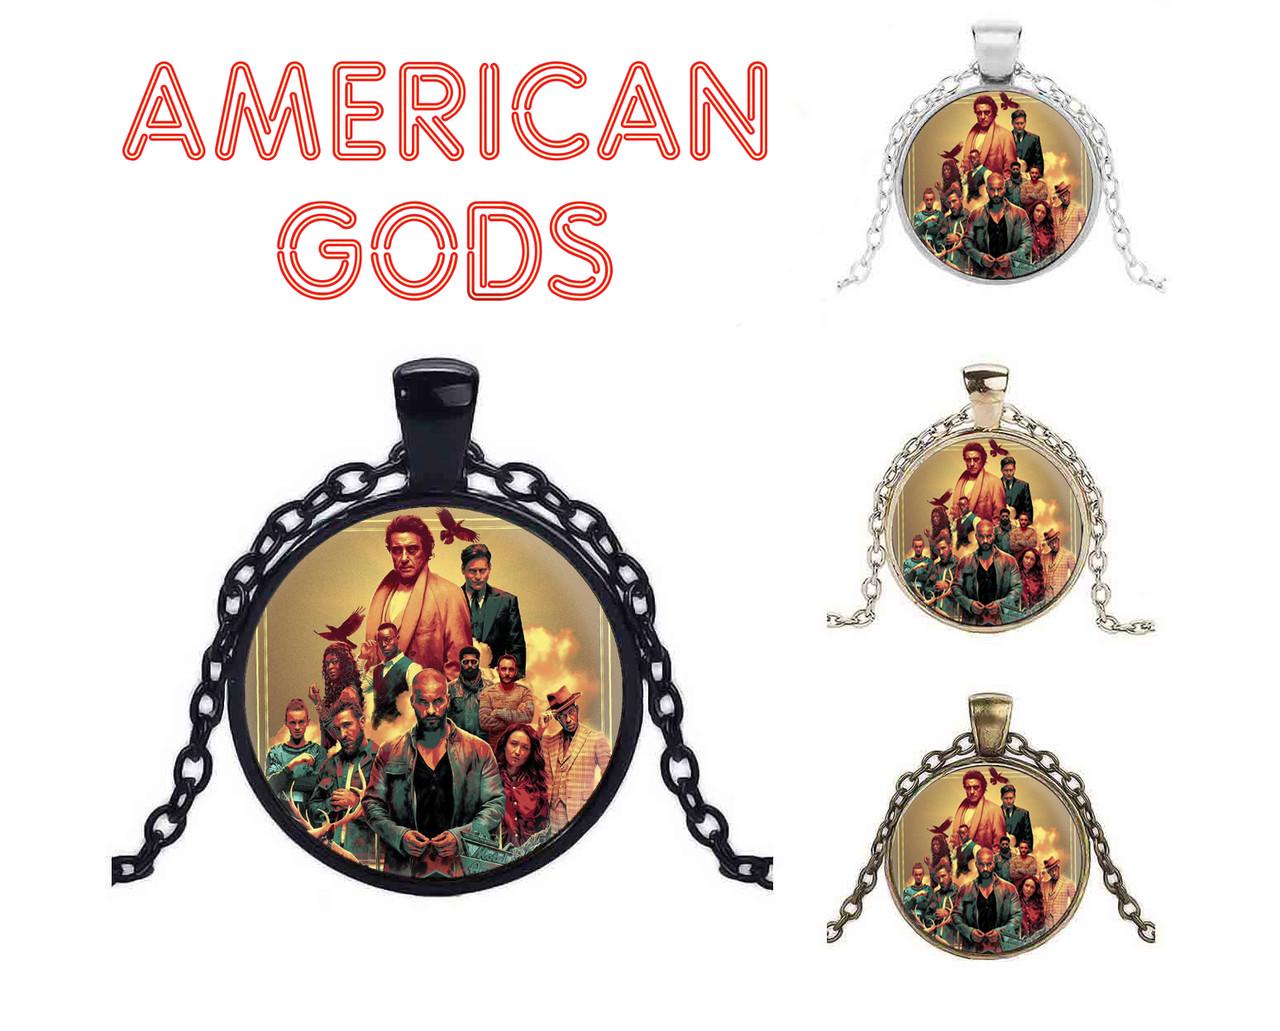 Кулон Американские боги / American Gods с персонажами